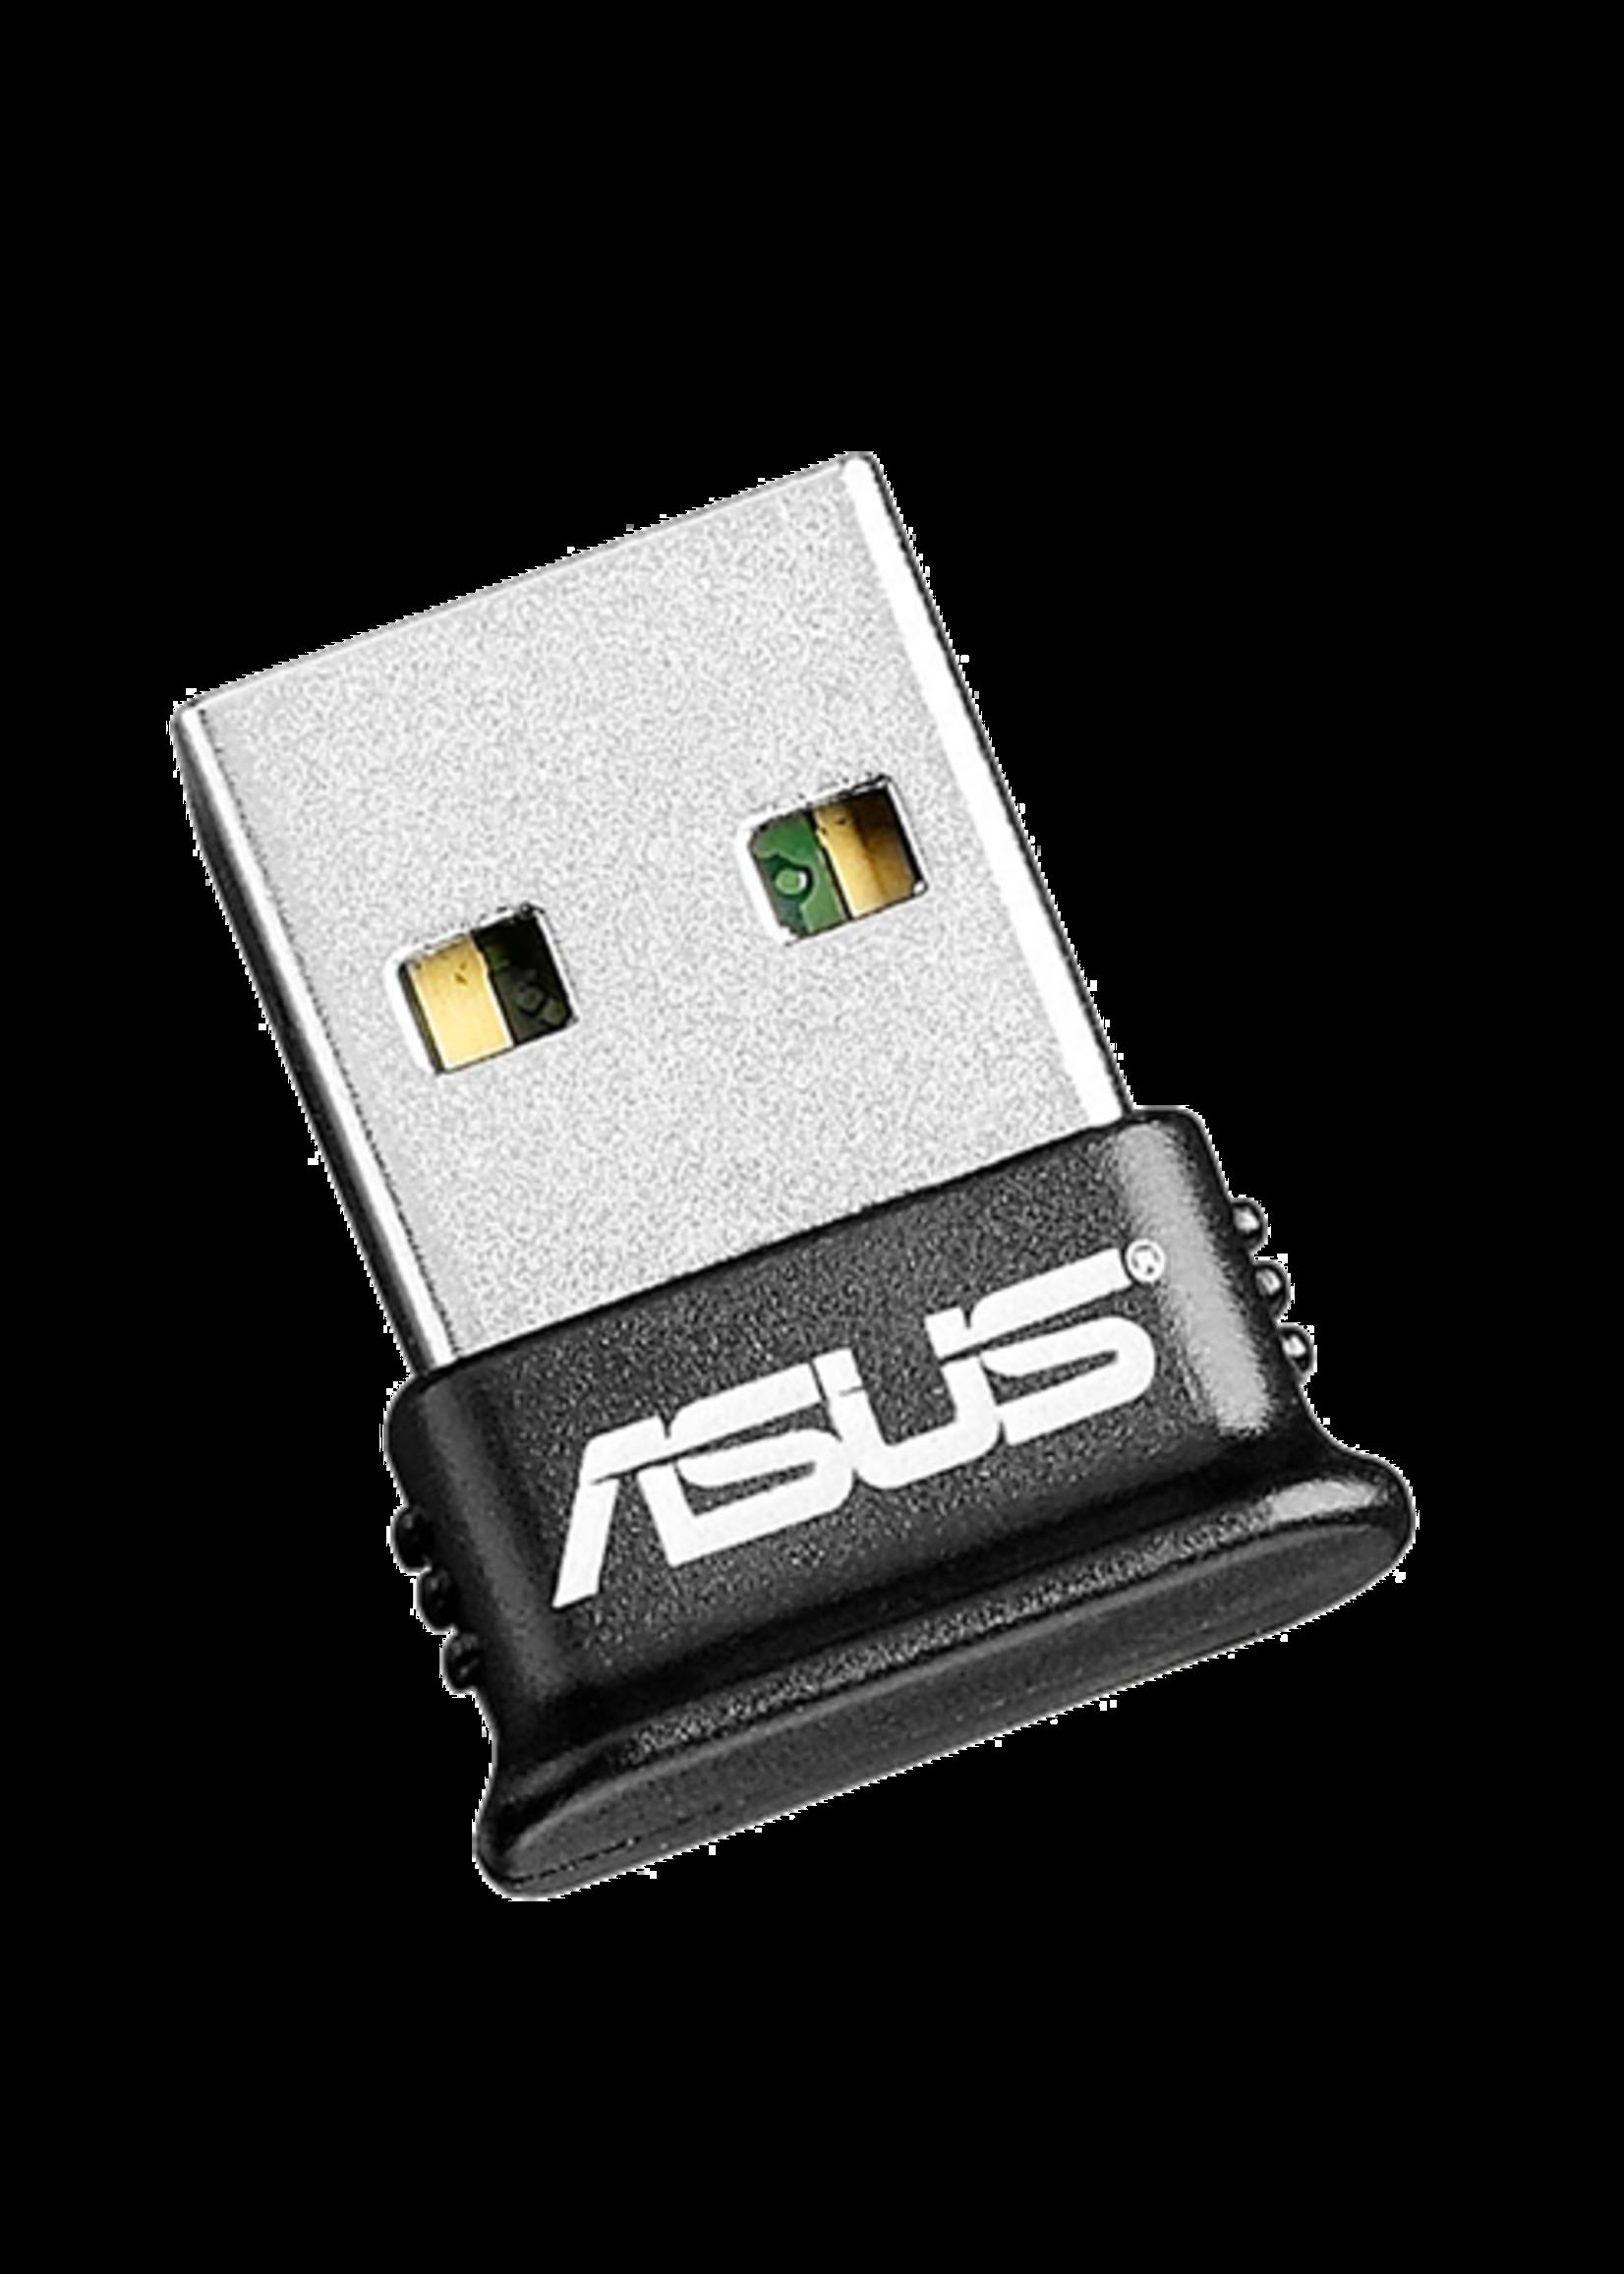 ASUS ASUS USB-BT400 Bluetooth 4.0 adapter